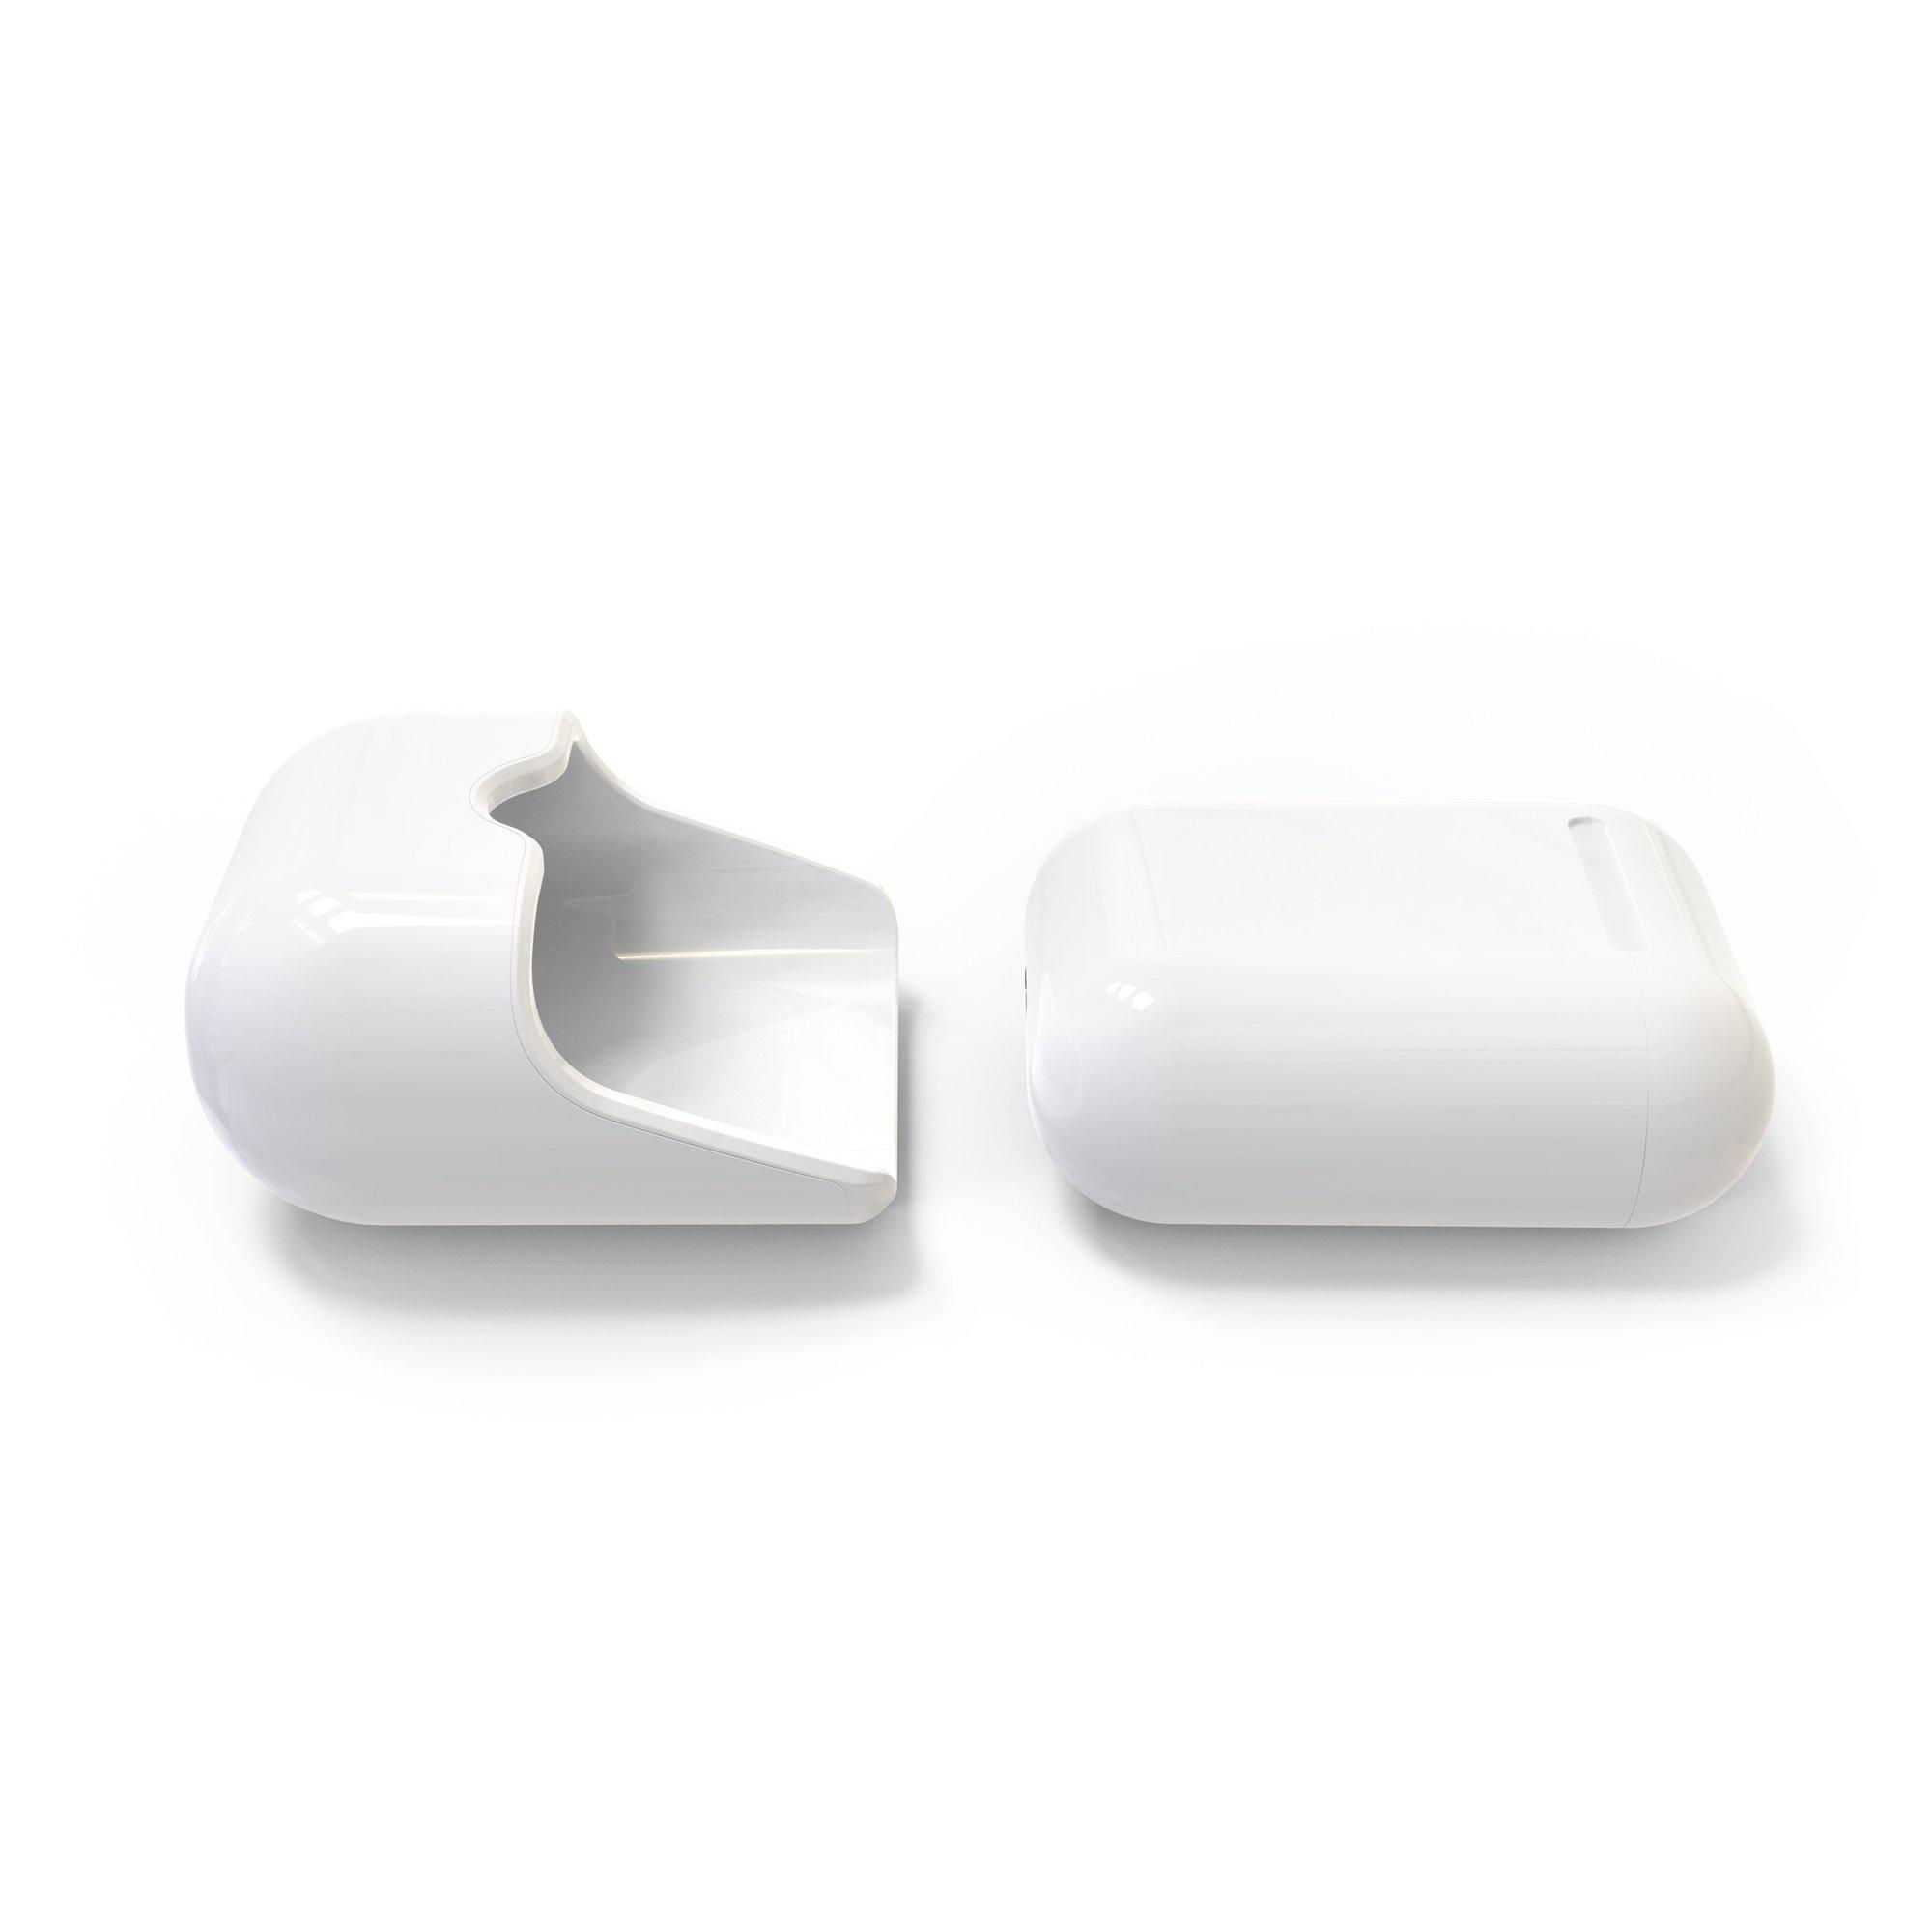 Draadloos airpods opladen QI Hyperjuice wireless